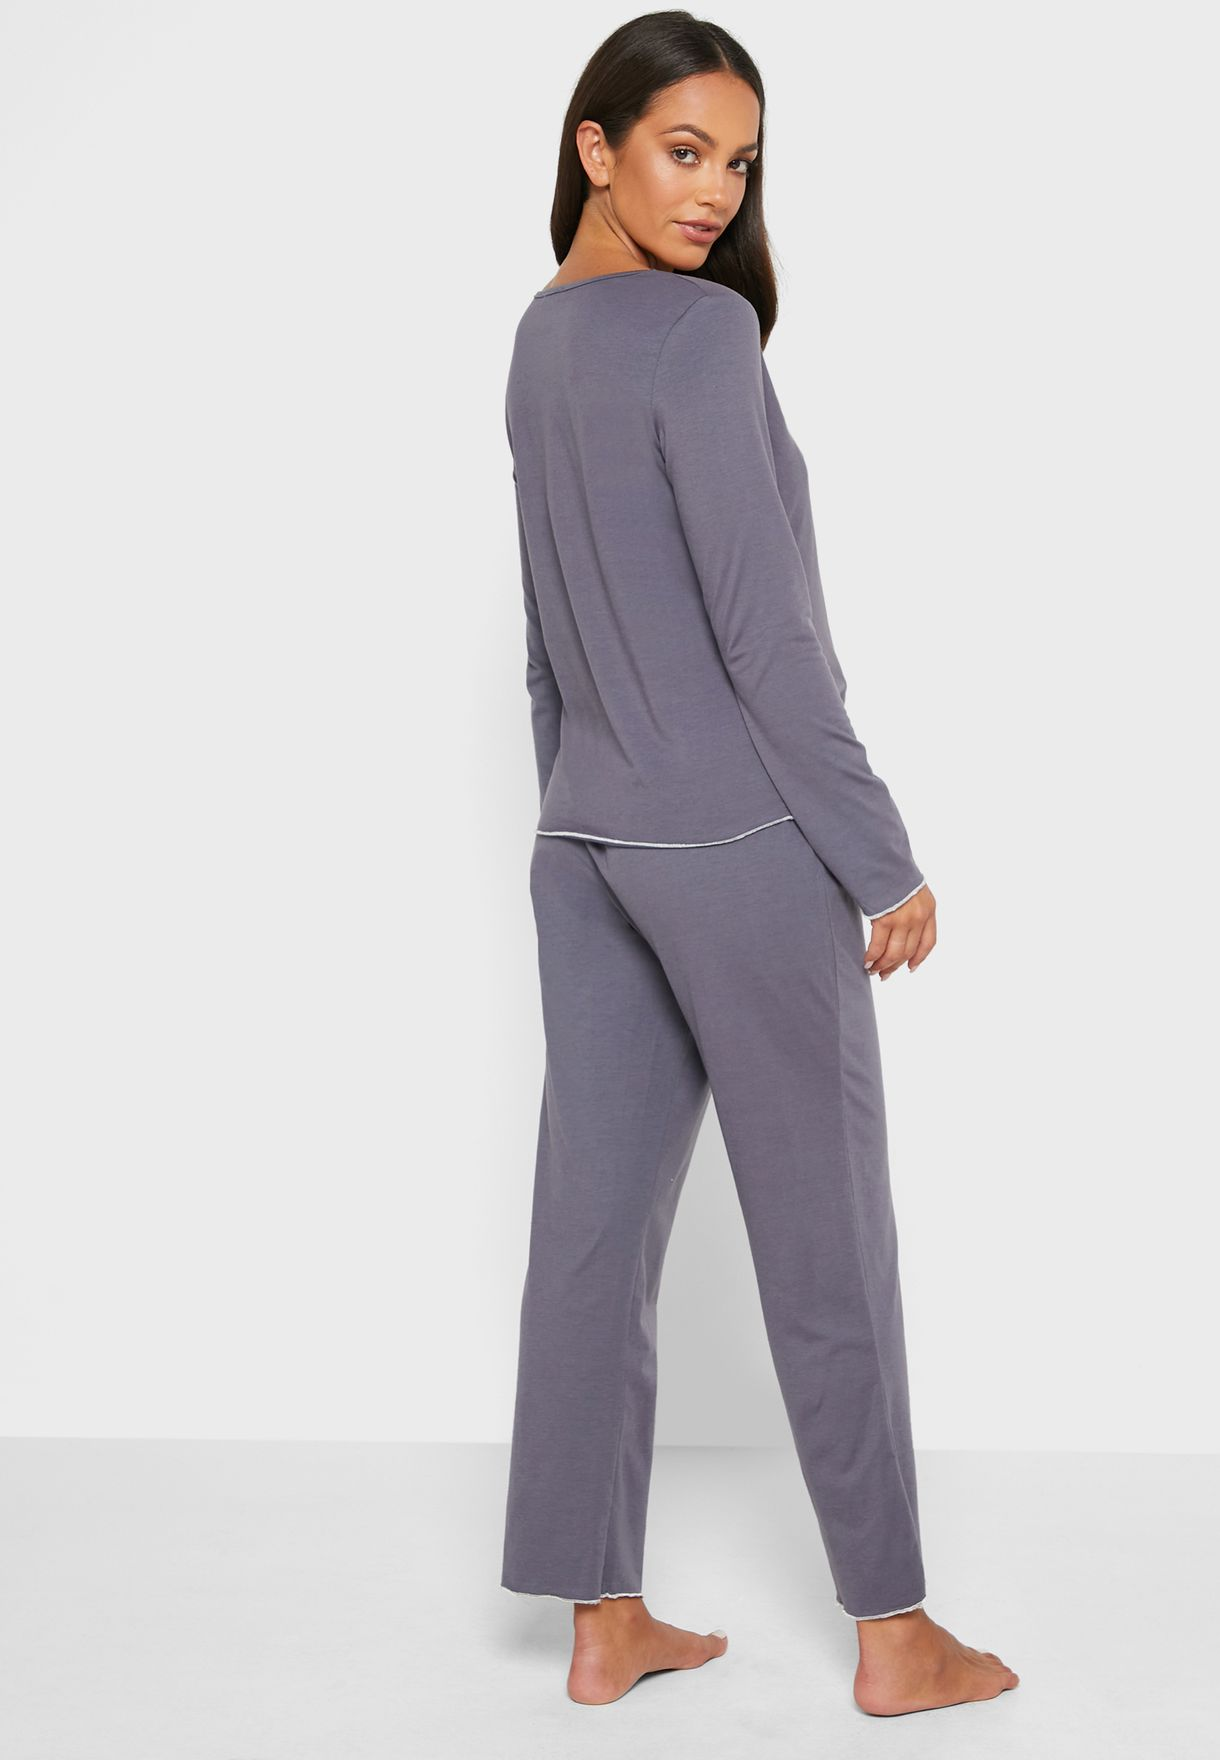 Pipped Hem Pyjama Set